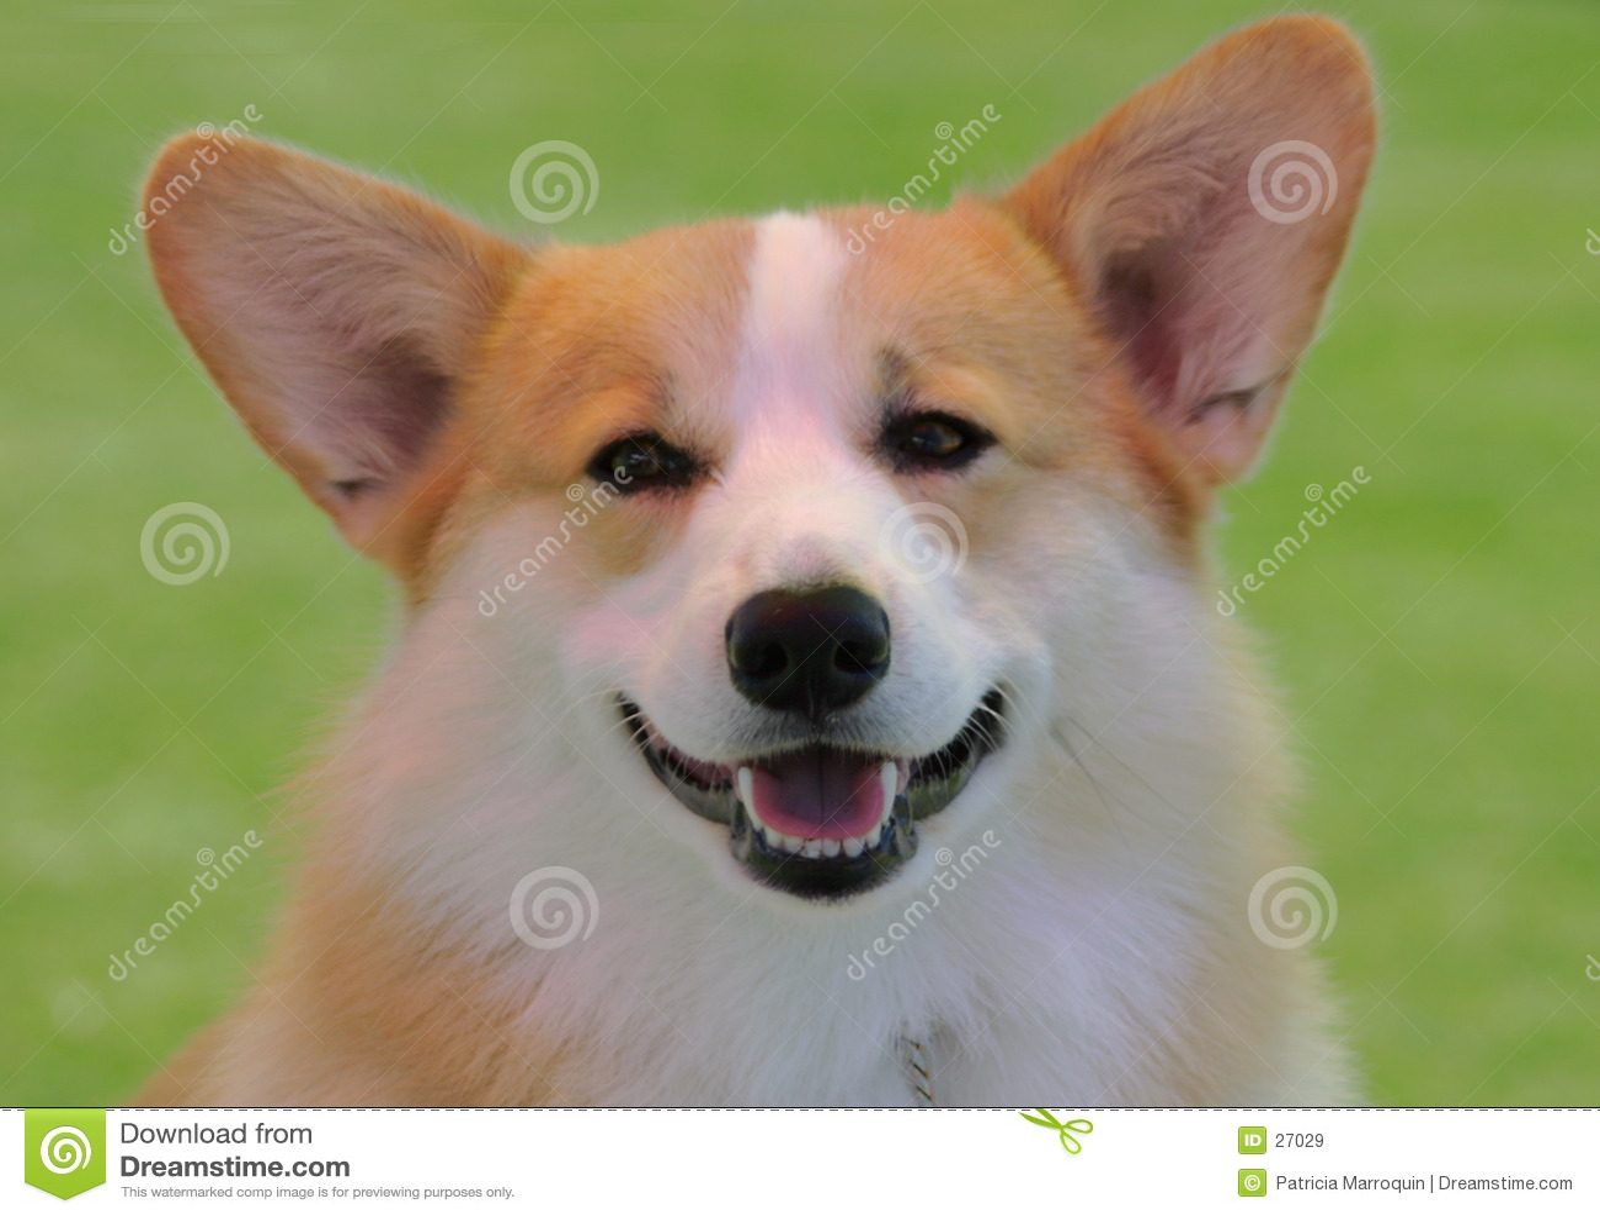 Smiling Corgi